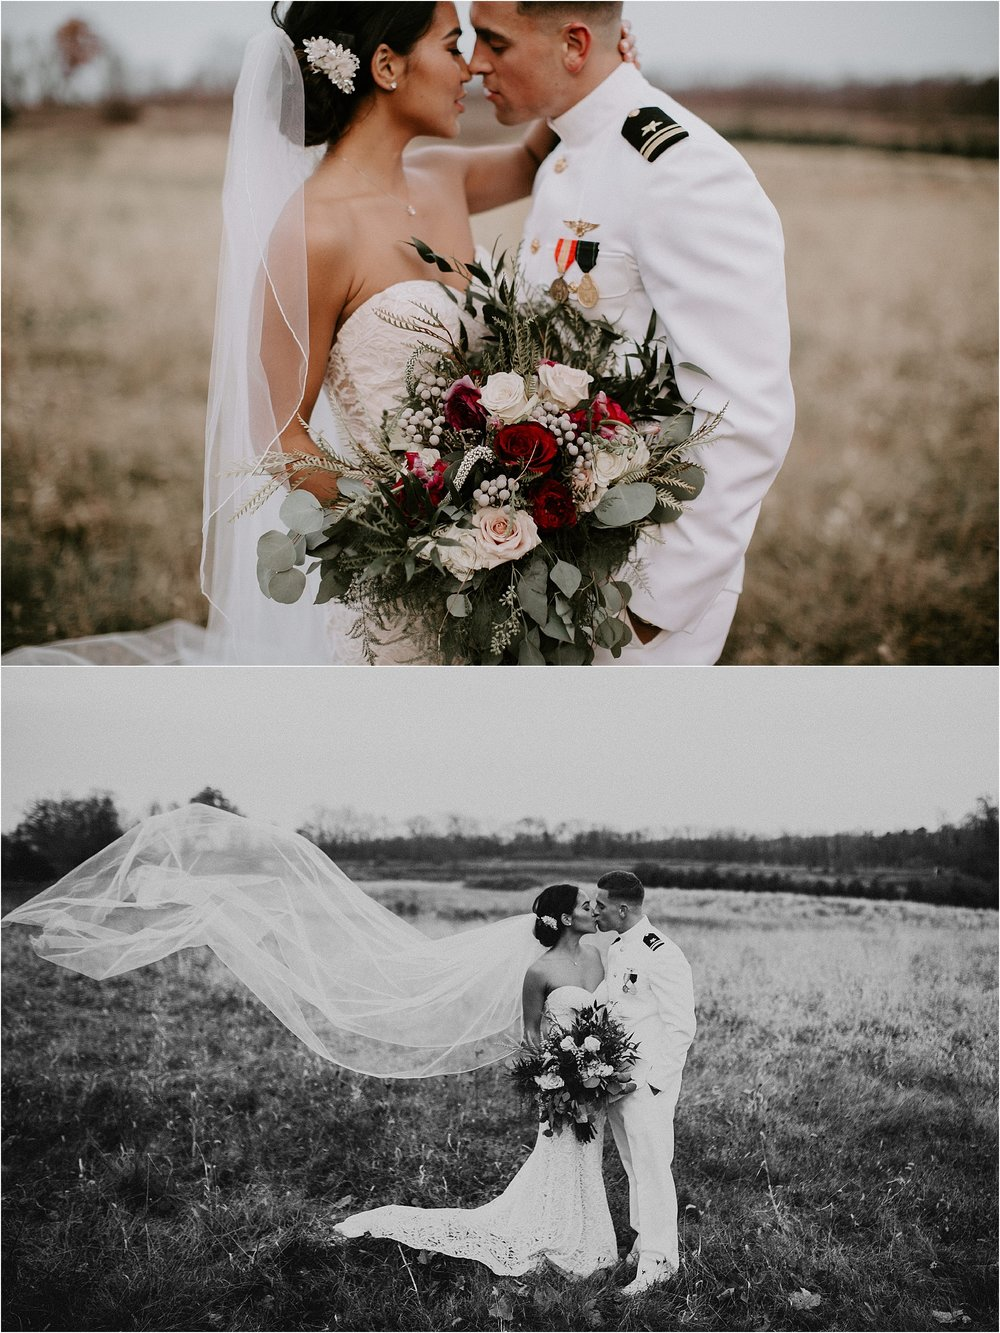 Sarah_Brookhart_Harrisburg_Wedding_Photographer_0037.jpg